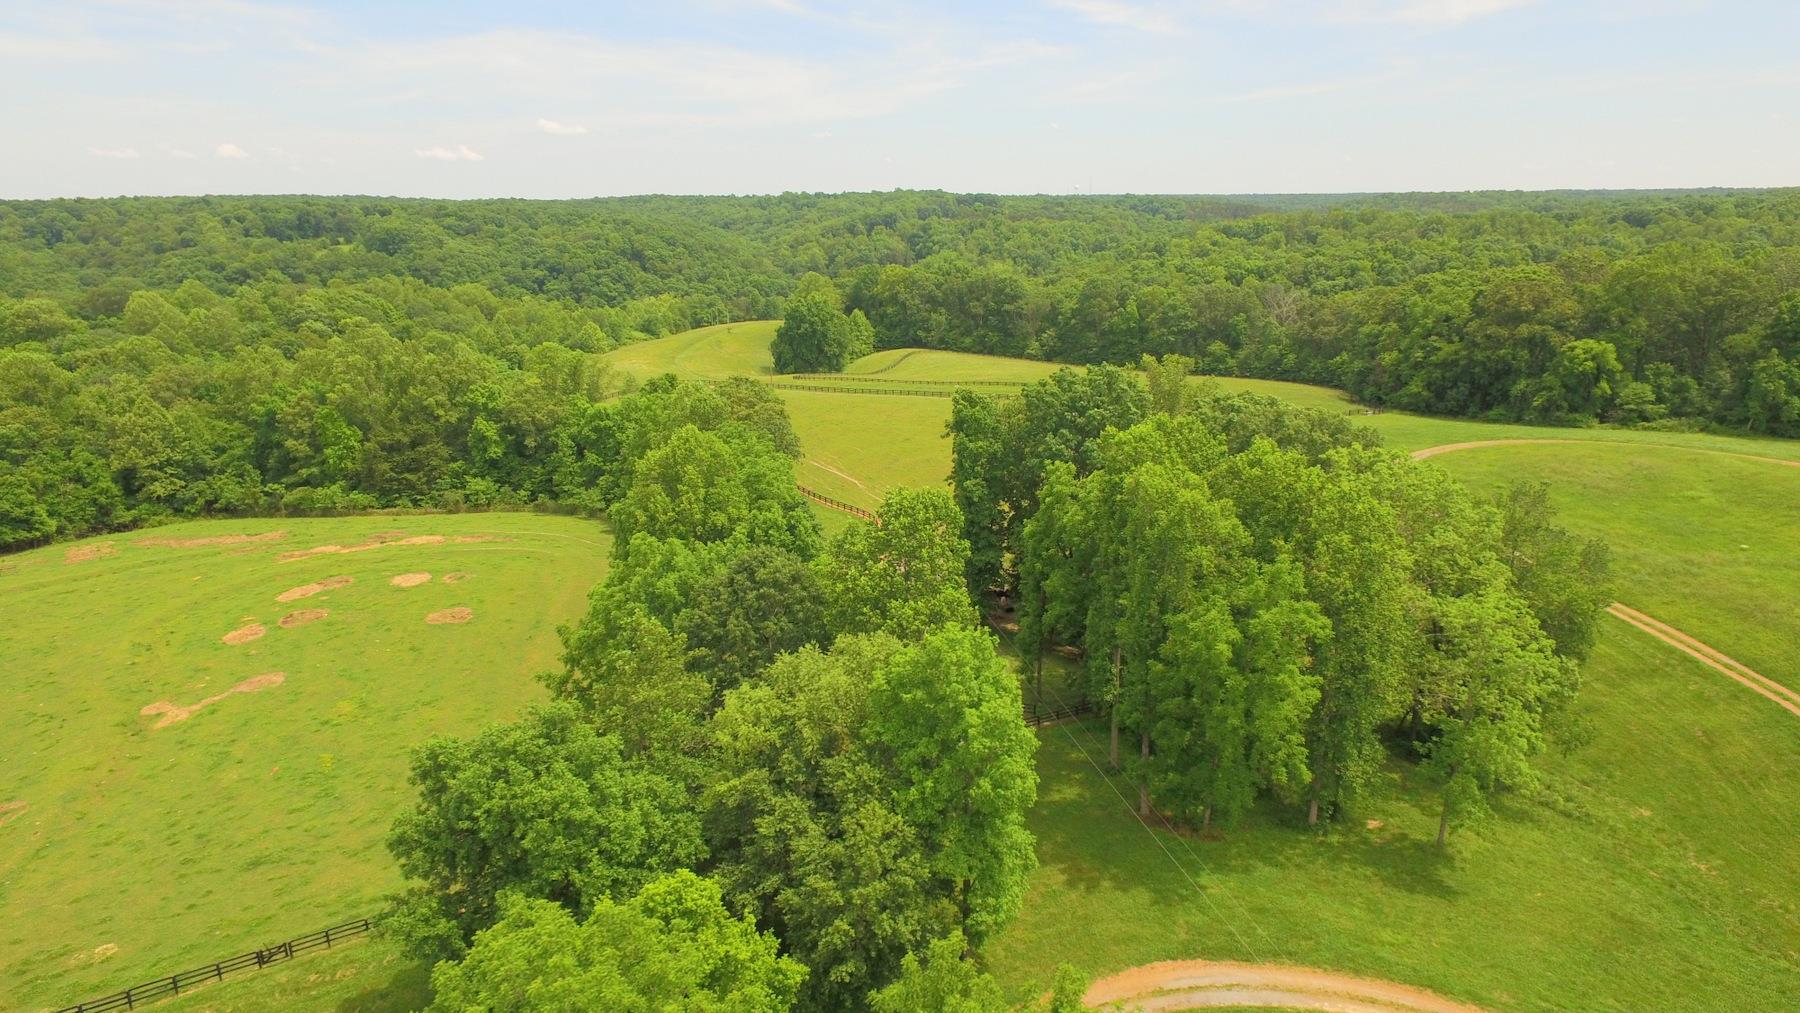 0 Taylor Cemetery R, Franklin, TN 37068 - Franklin, TN real estate listing